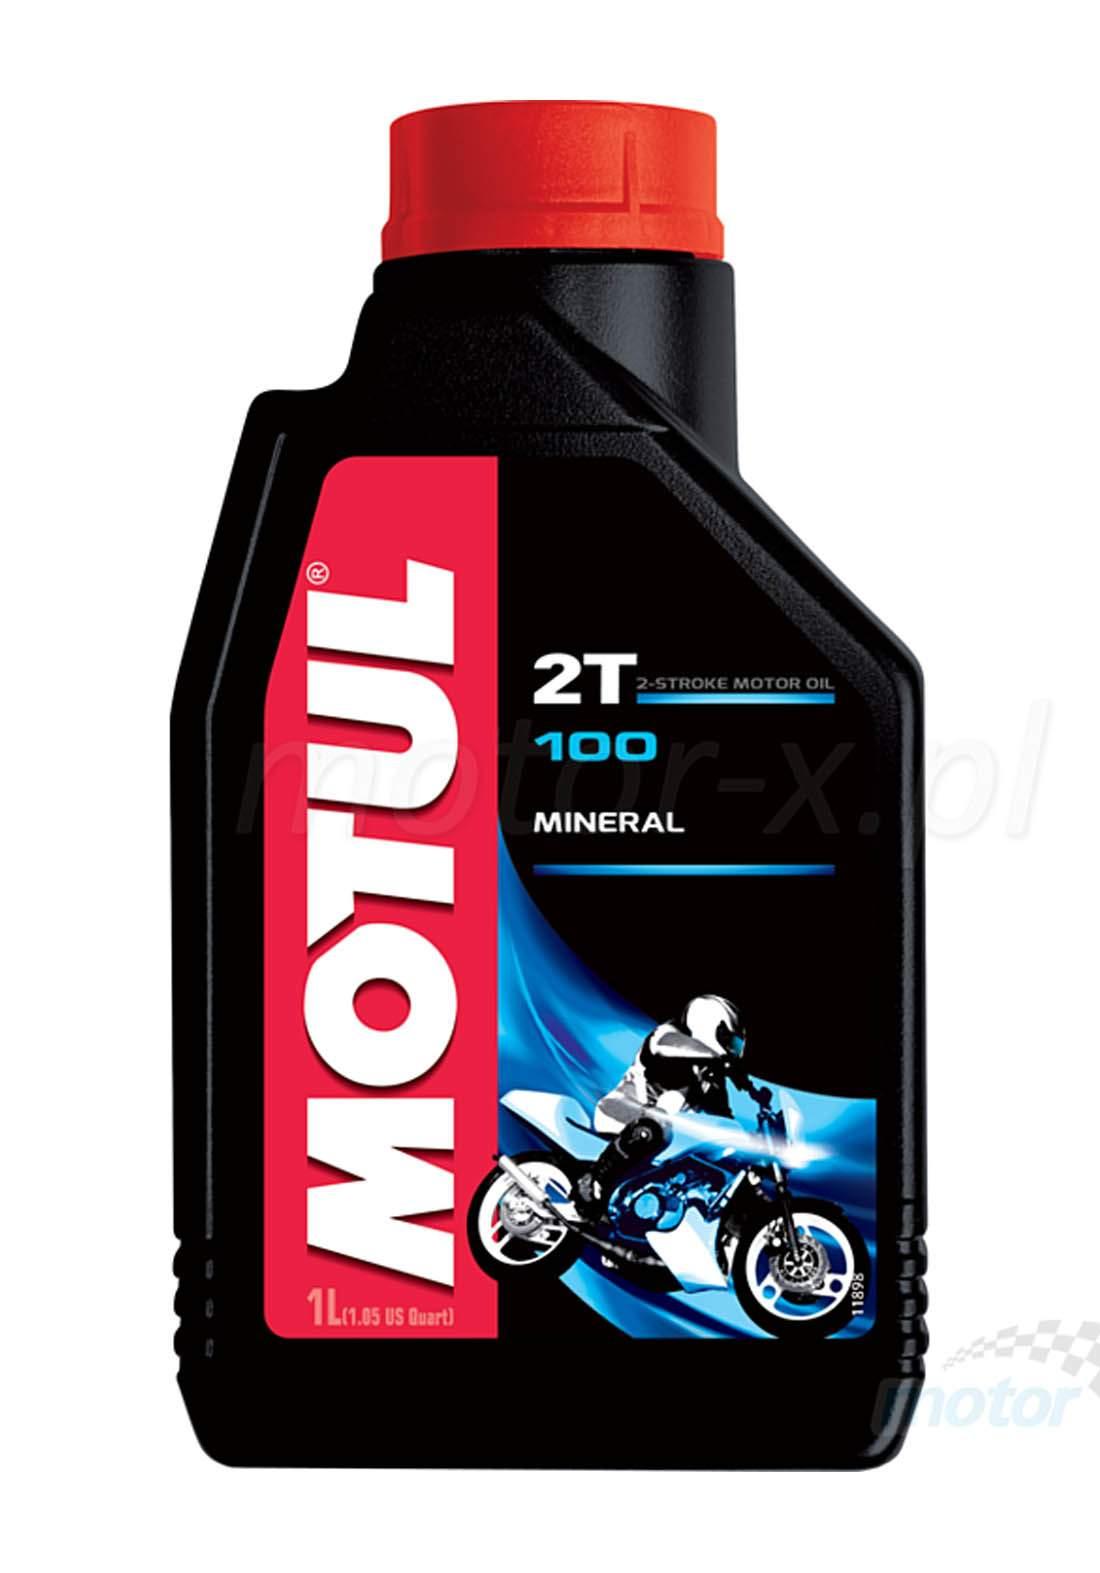 Motul 2T 100 Engine Oil Motomix Mineral 1 L زيت محرك الدراجة النارية